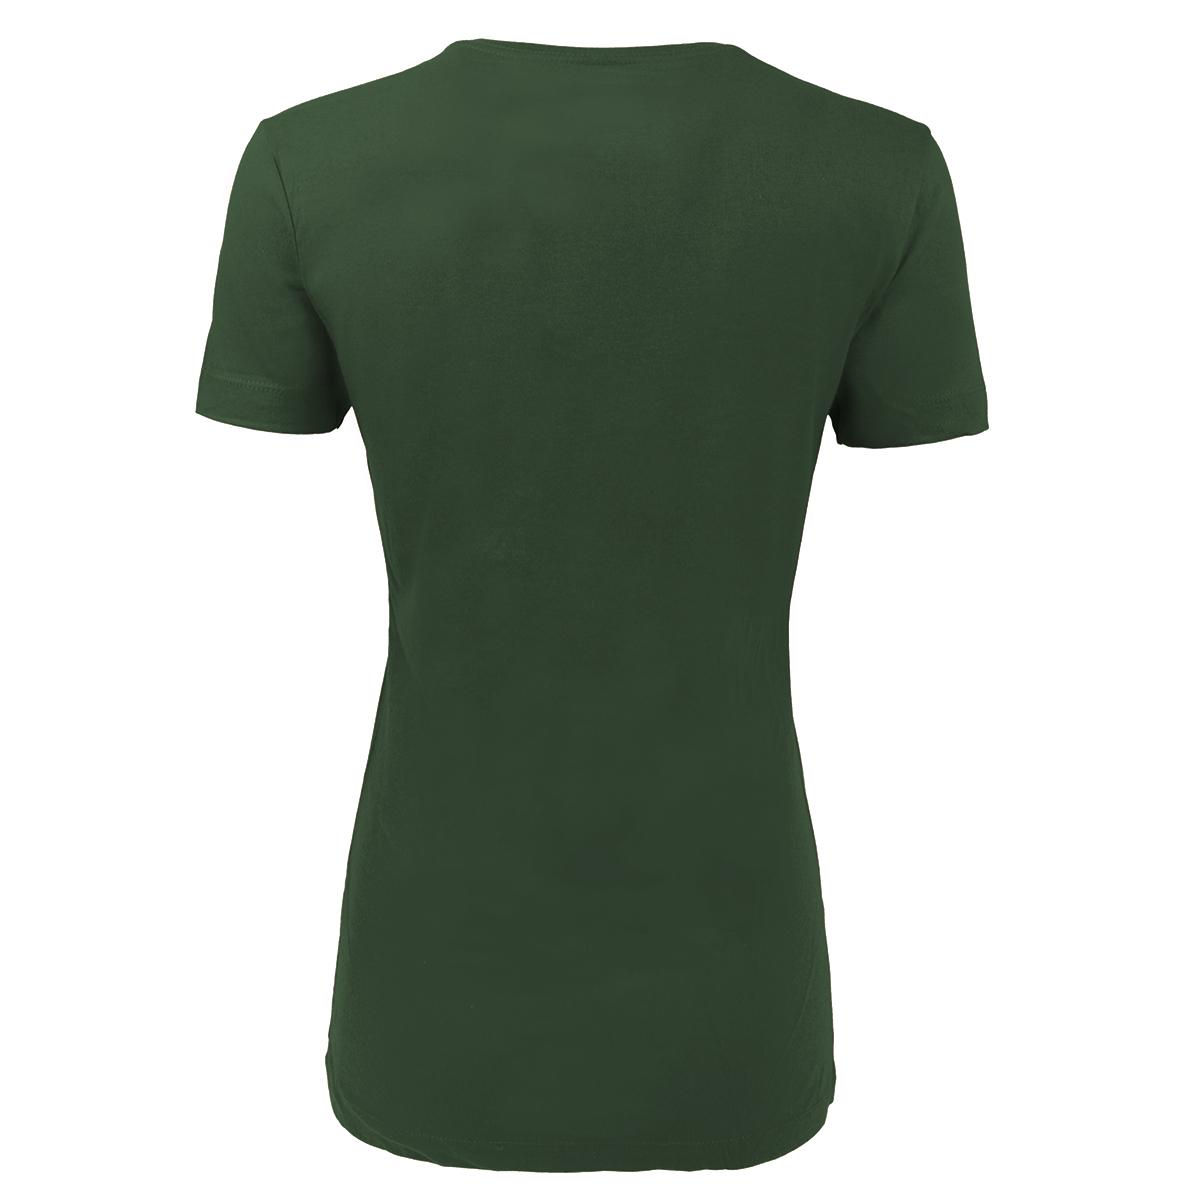 Nike-Women-039-s-Cotton-Slim-Fit-T-Shirt thumbnail 7